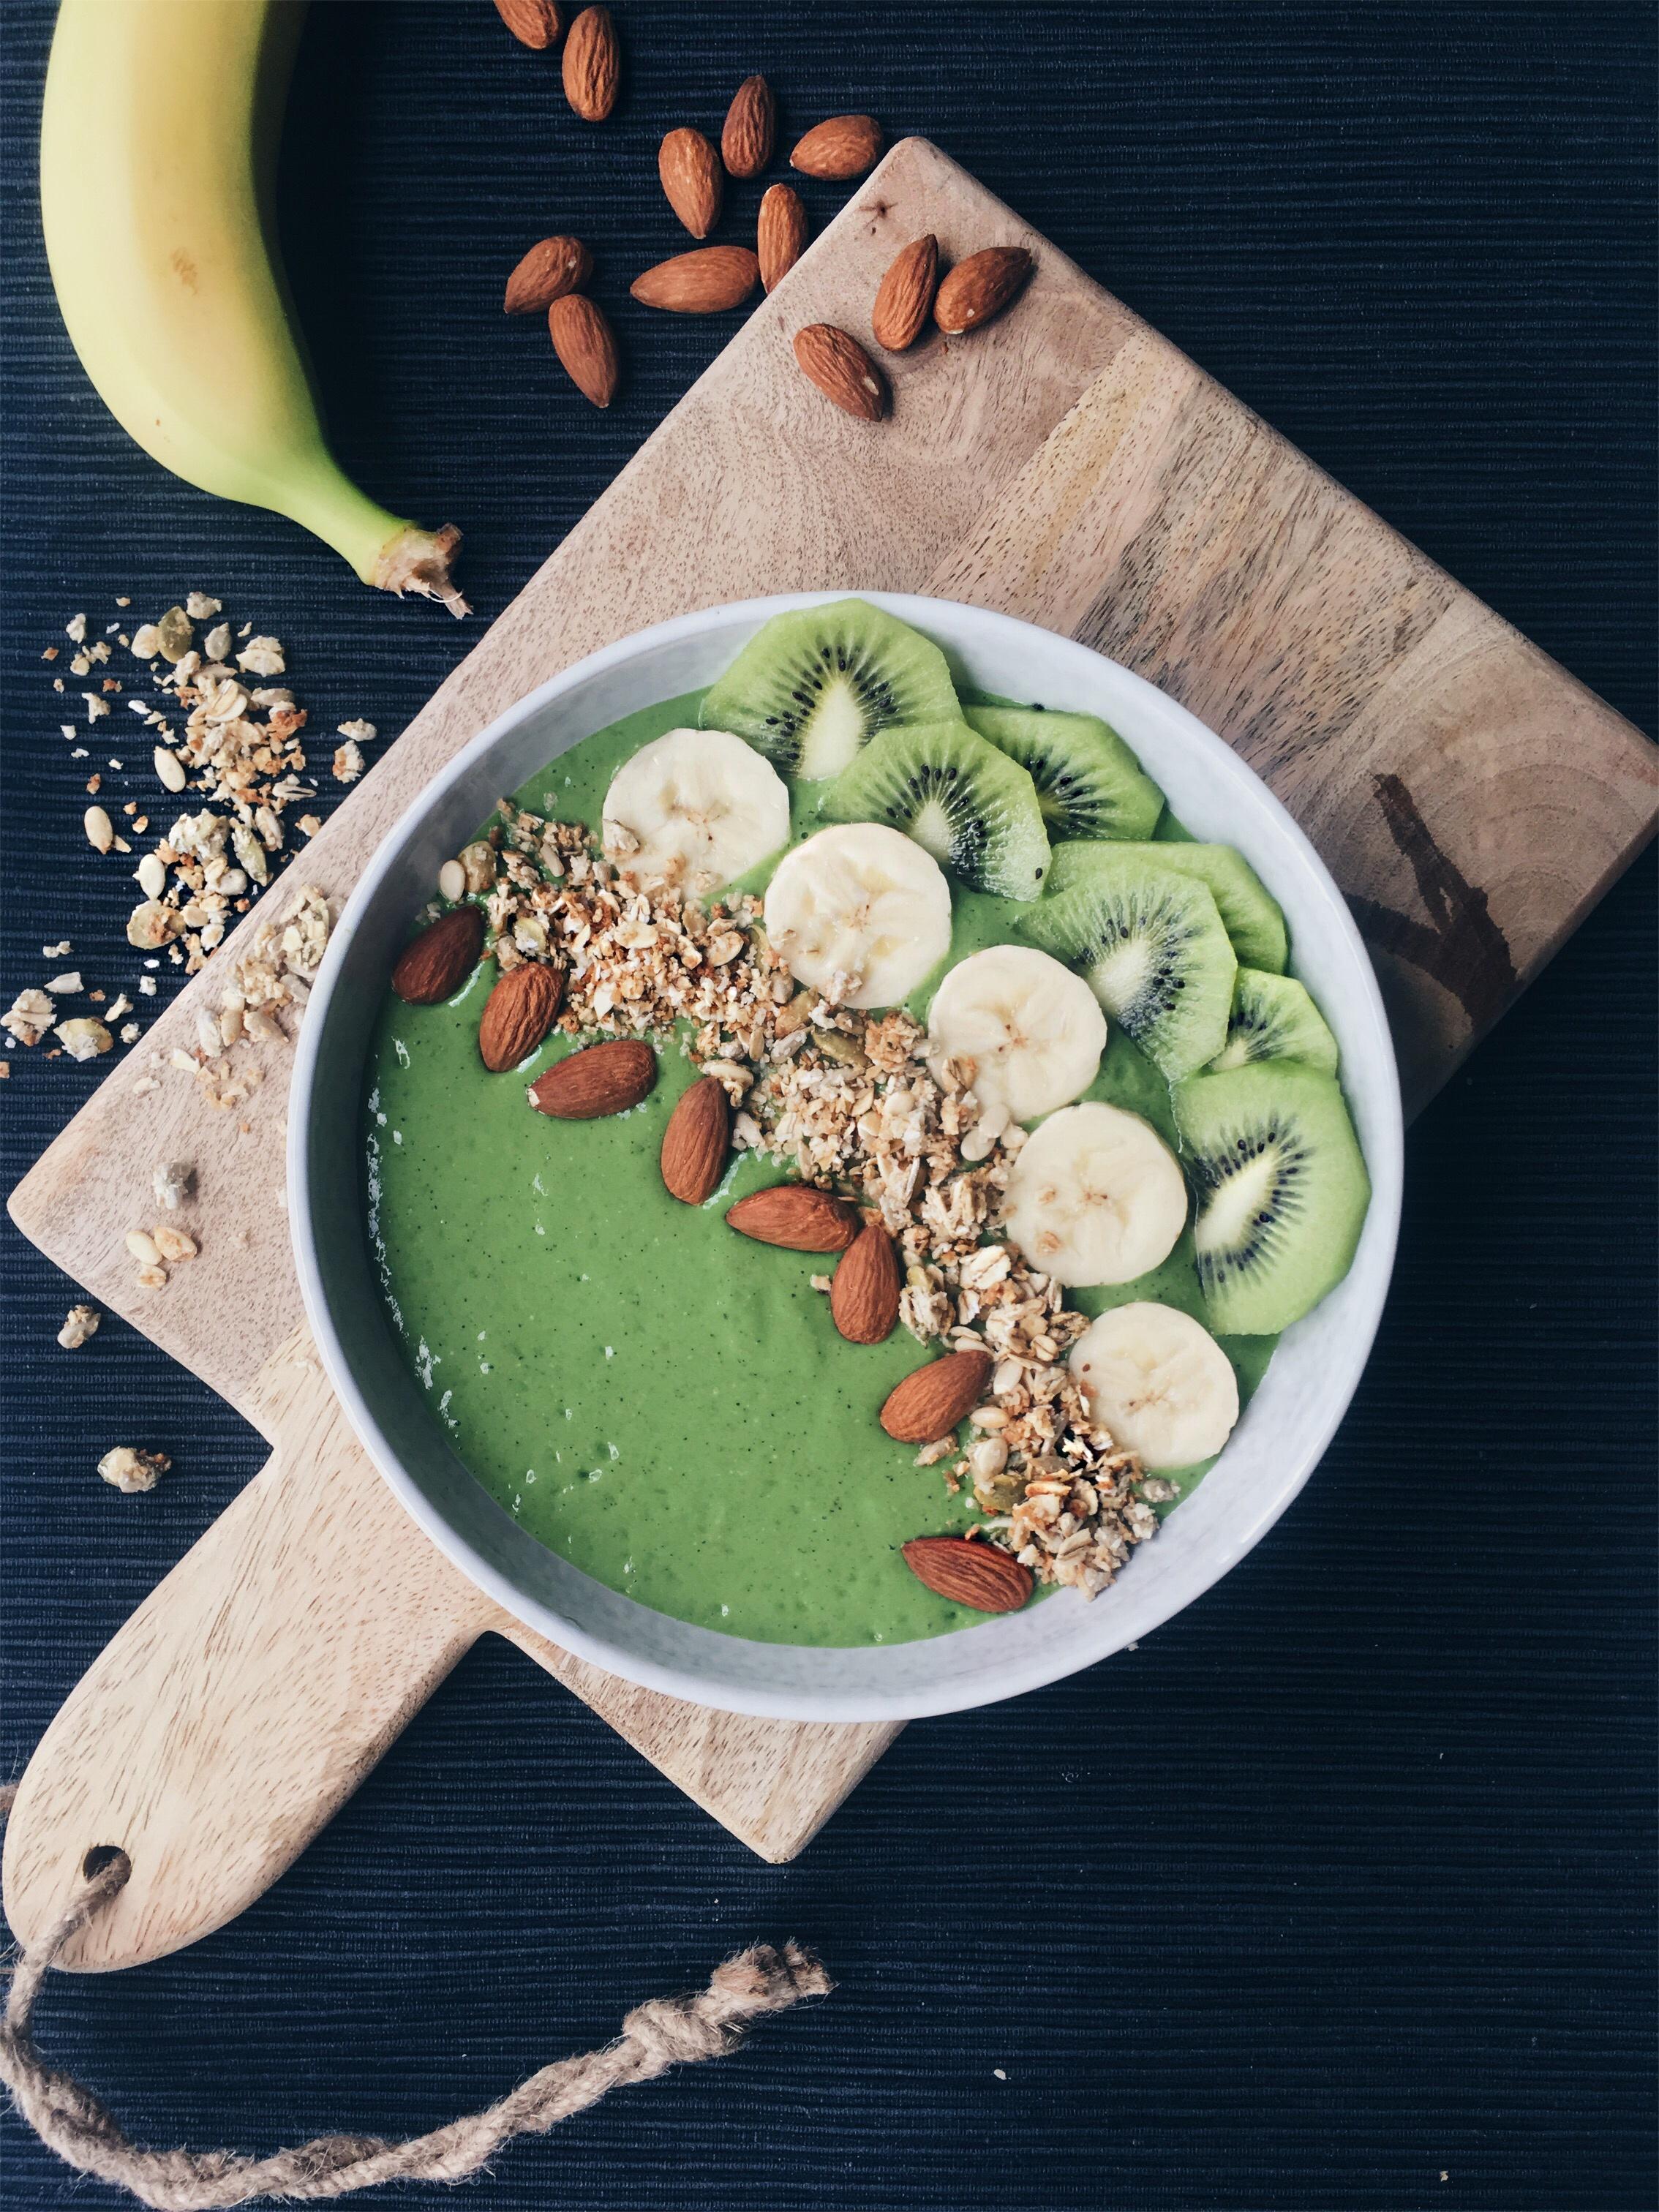 miracle-morning-smoothie-bowl